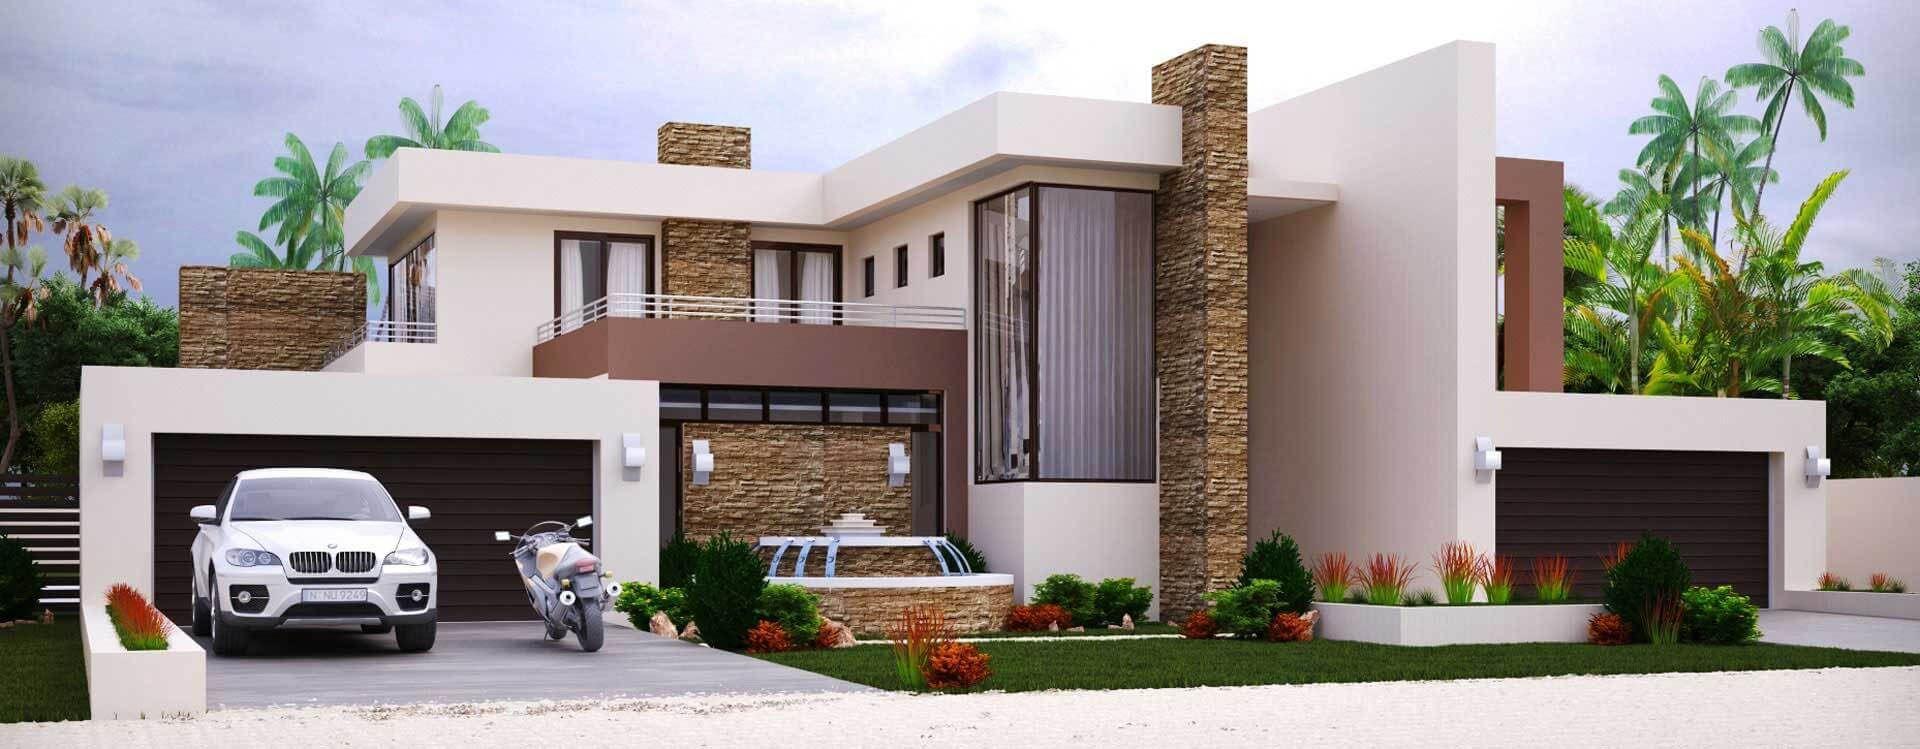 4 Bedroom House Plan 8211 M497d House Plans For Sale House Plans South Africa Modern Style House Plans